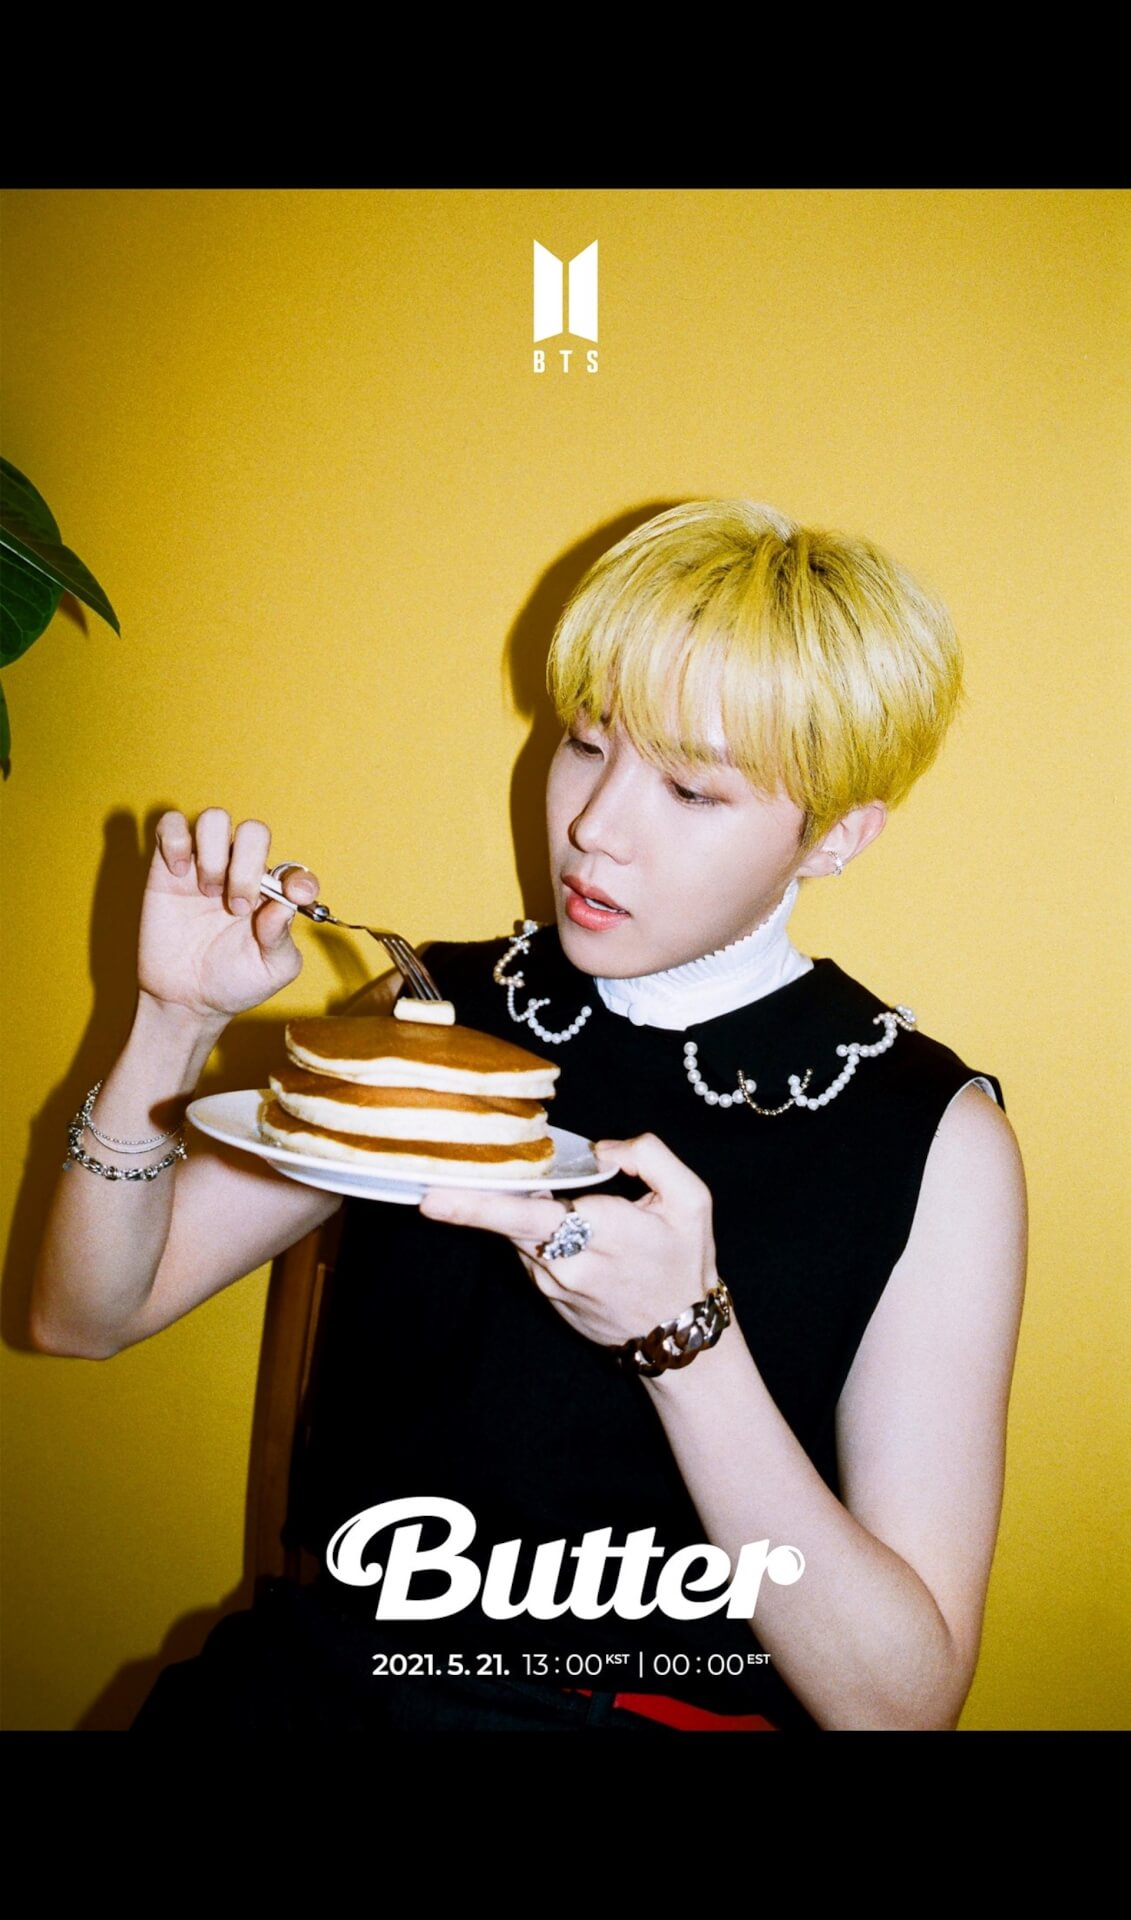 "BTSニューシングル""Butter""の第2弾ティーザーフォトが一挙解禁!メンバー勢ぞろい&ソロカットも music210517_bts_butter_4"